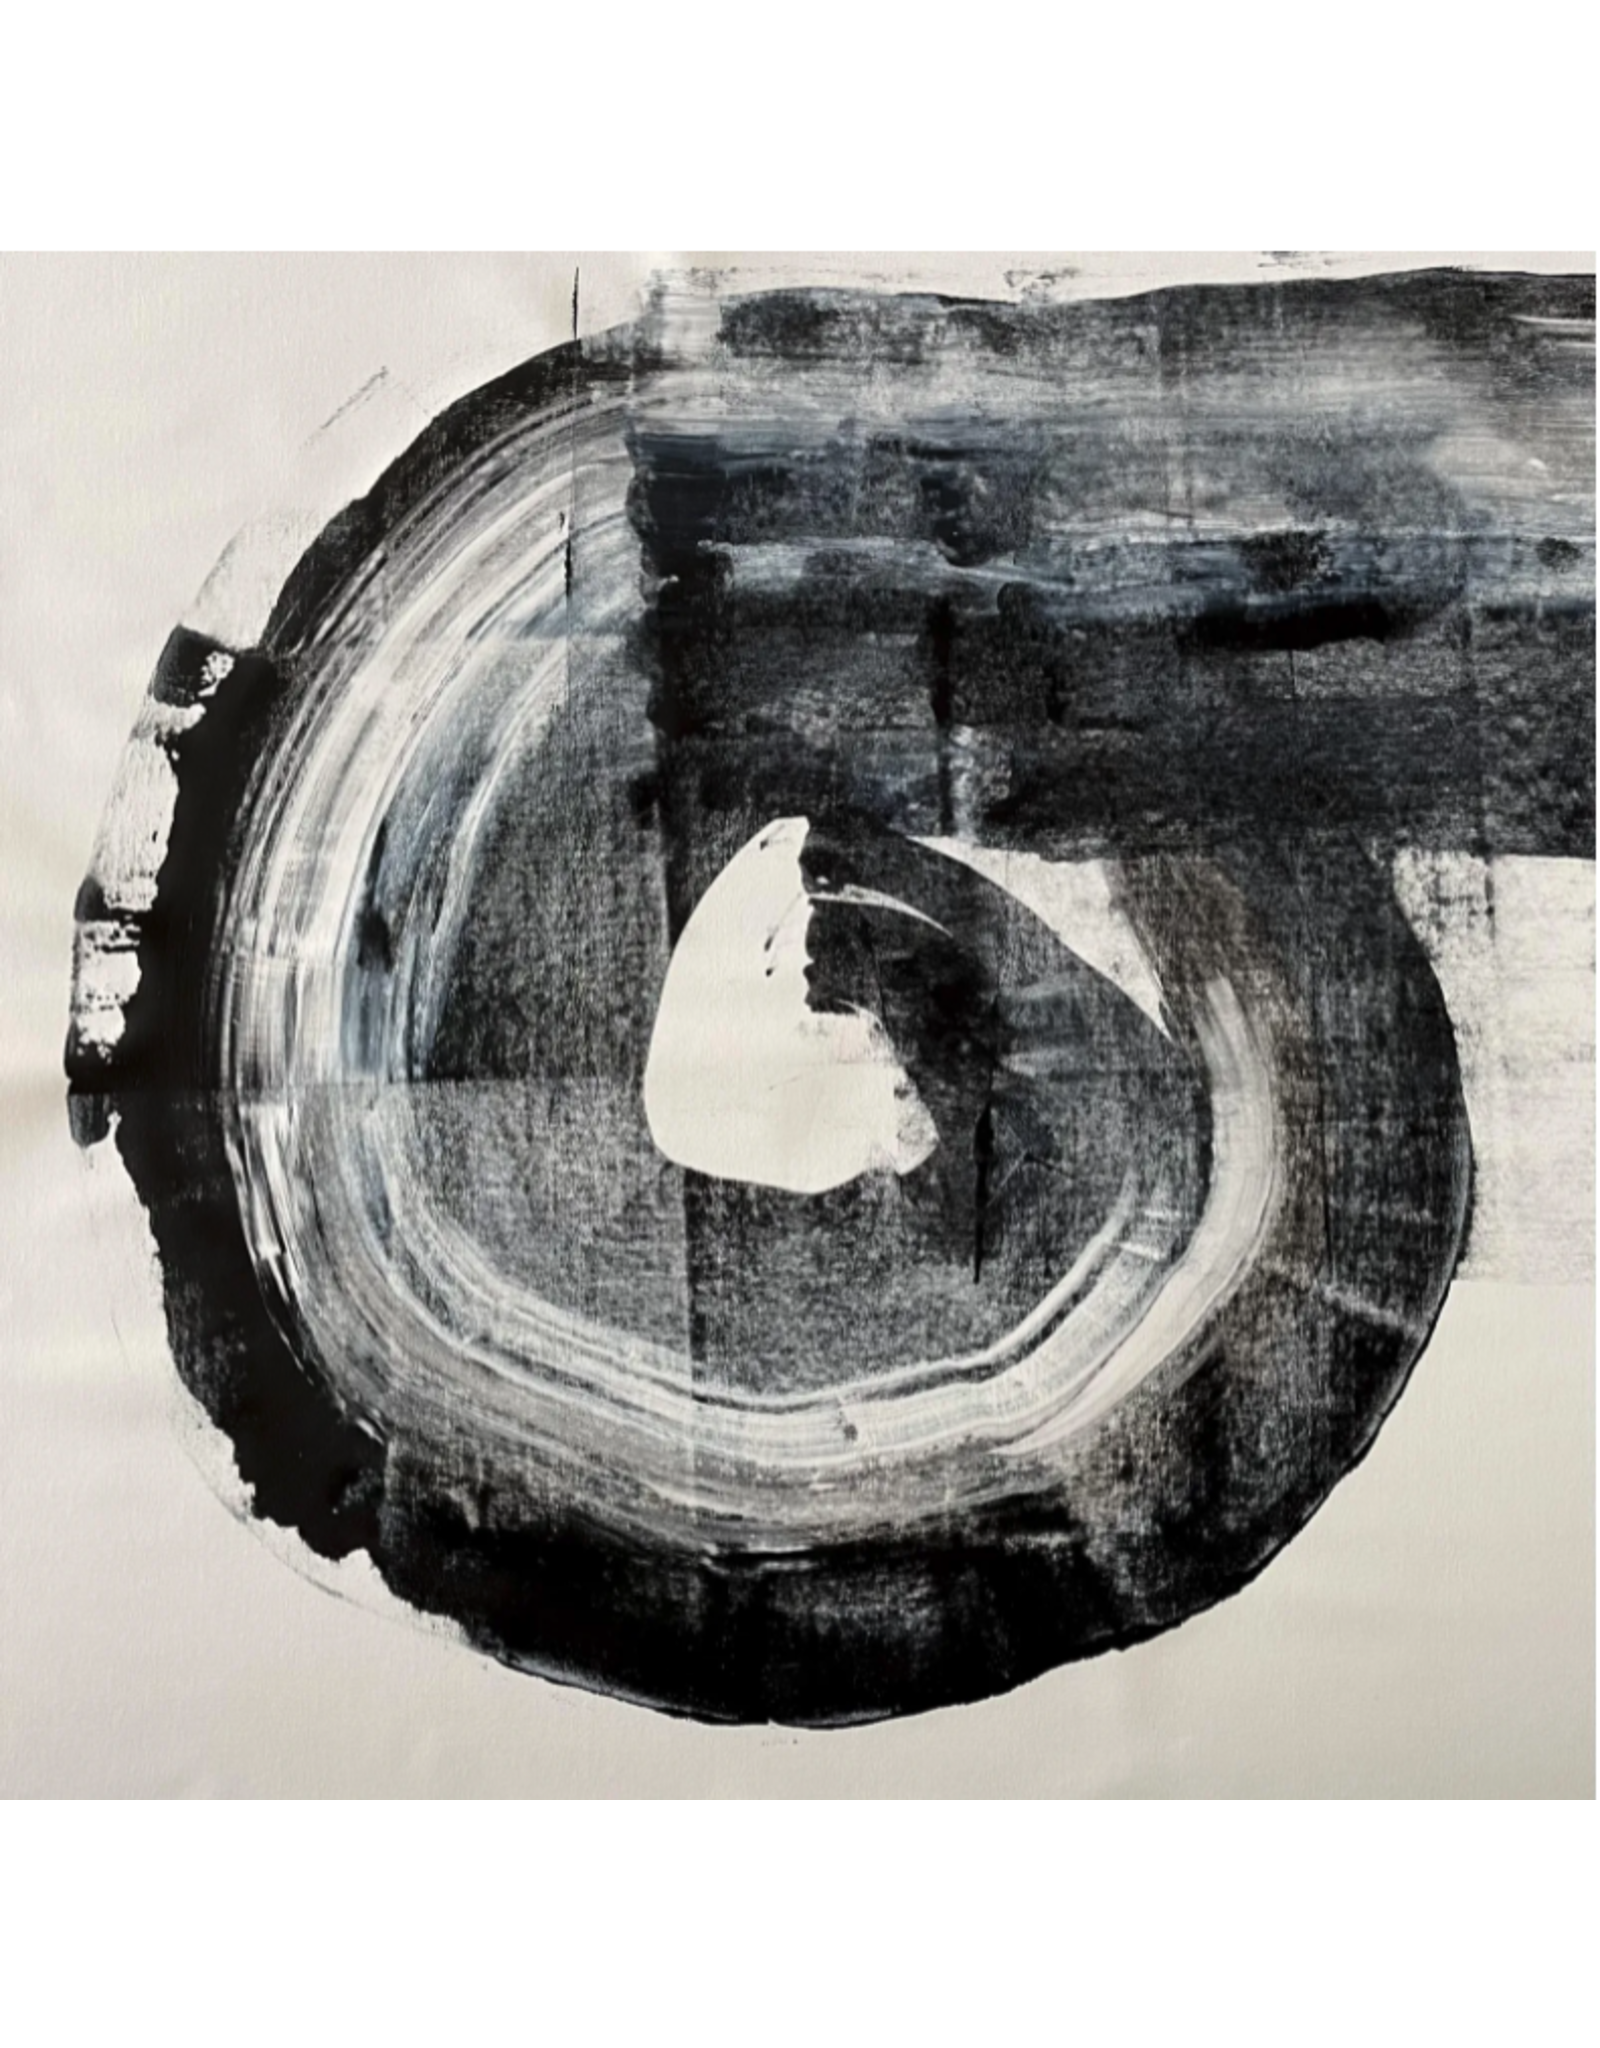 Abstract minimalist - acrylic on canvas #2